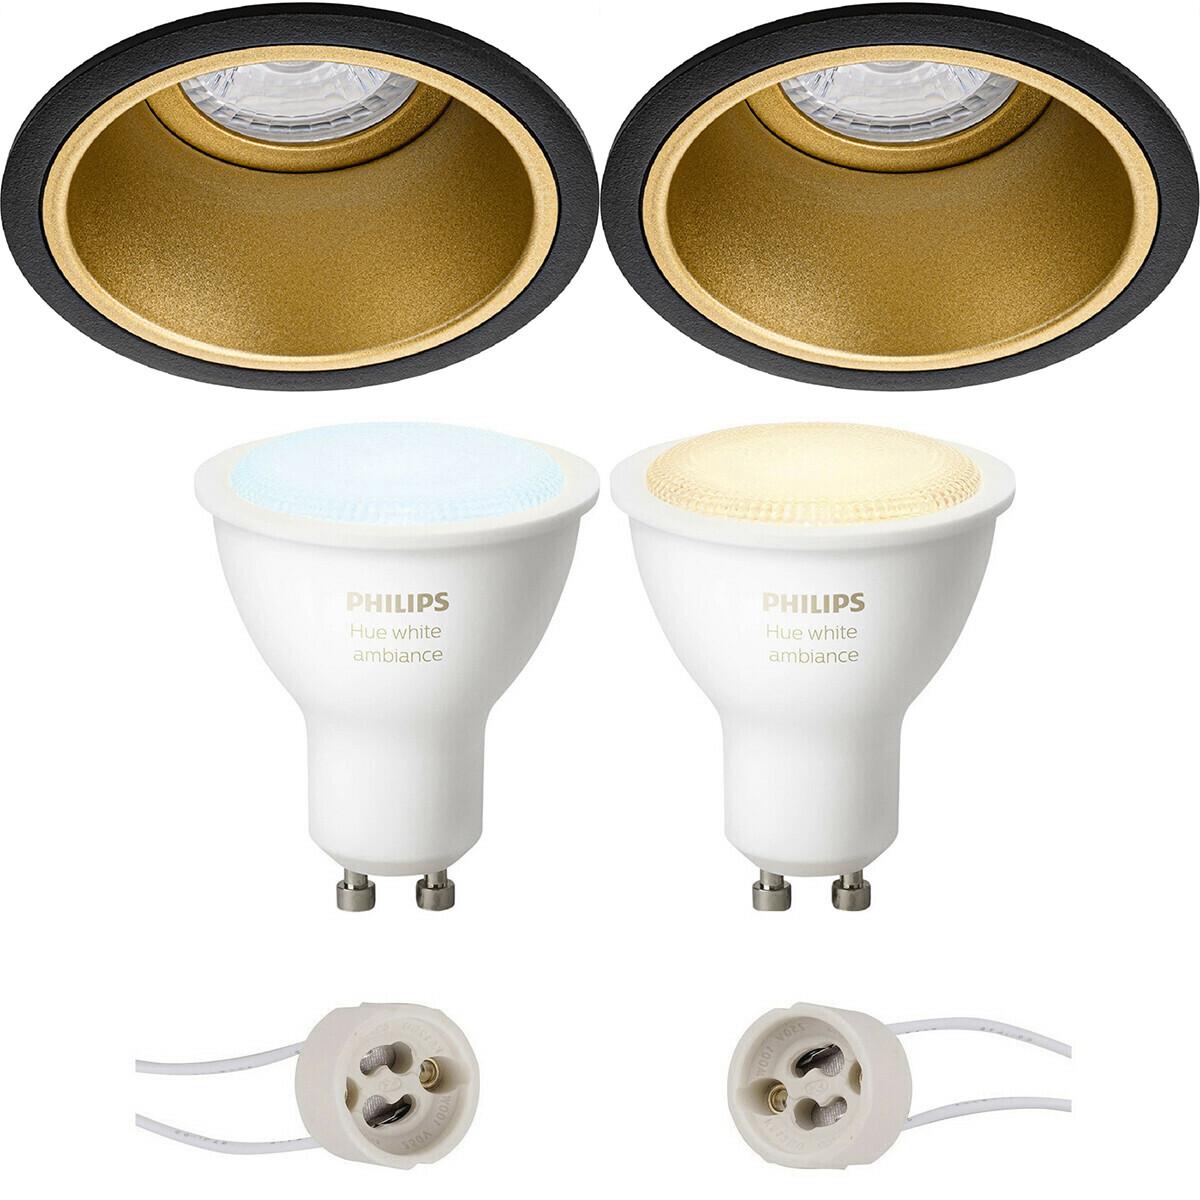 Pragmi Minko Pro - Inbouw Rond - Mat Zwart/Goud - Verdiept - Ø90mm - Philips Hue - LED Spot Set GU10